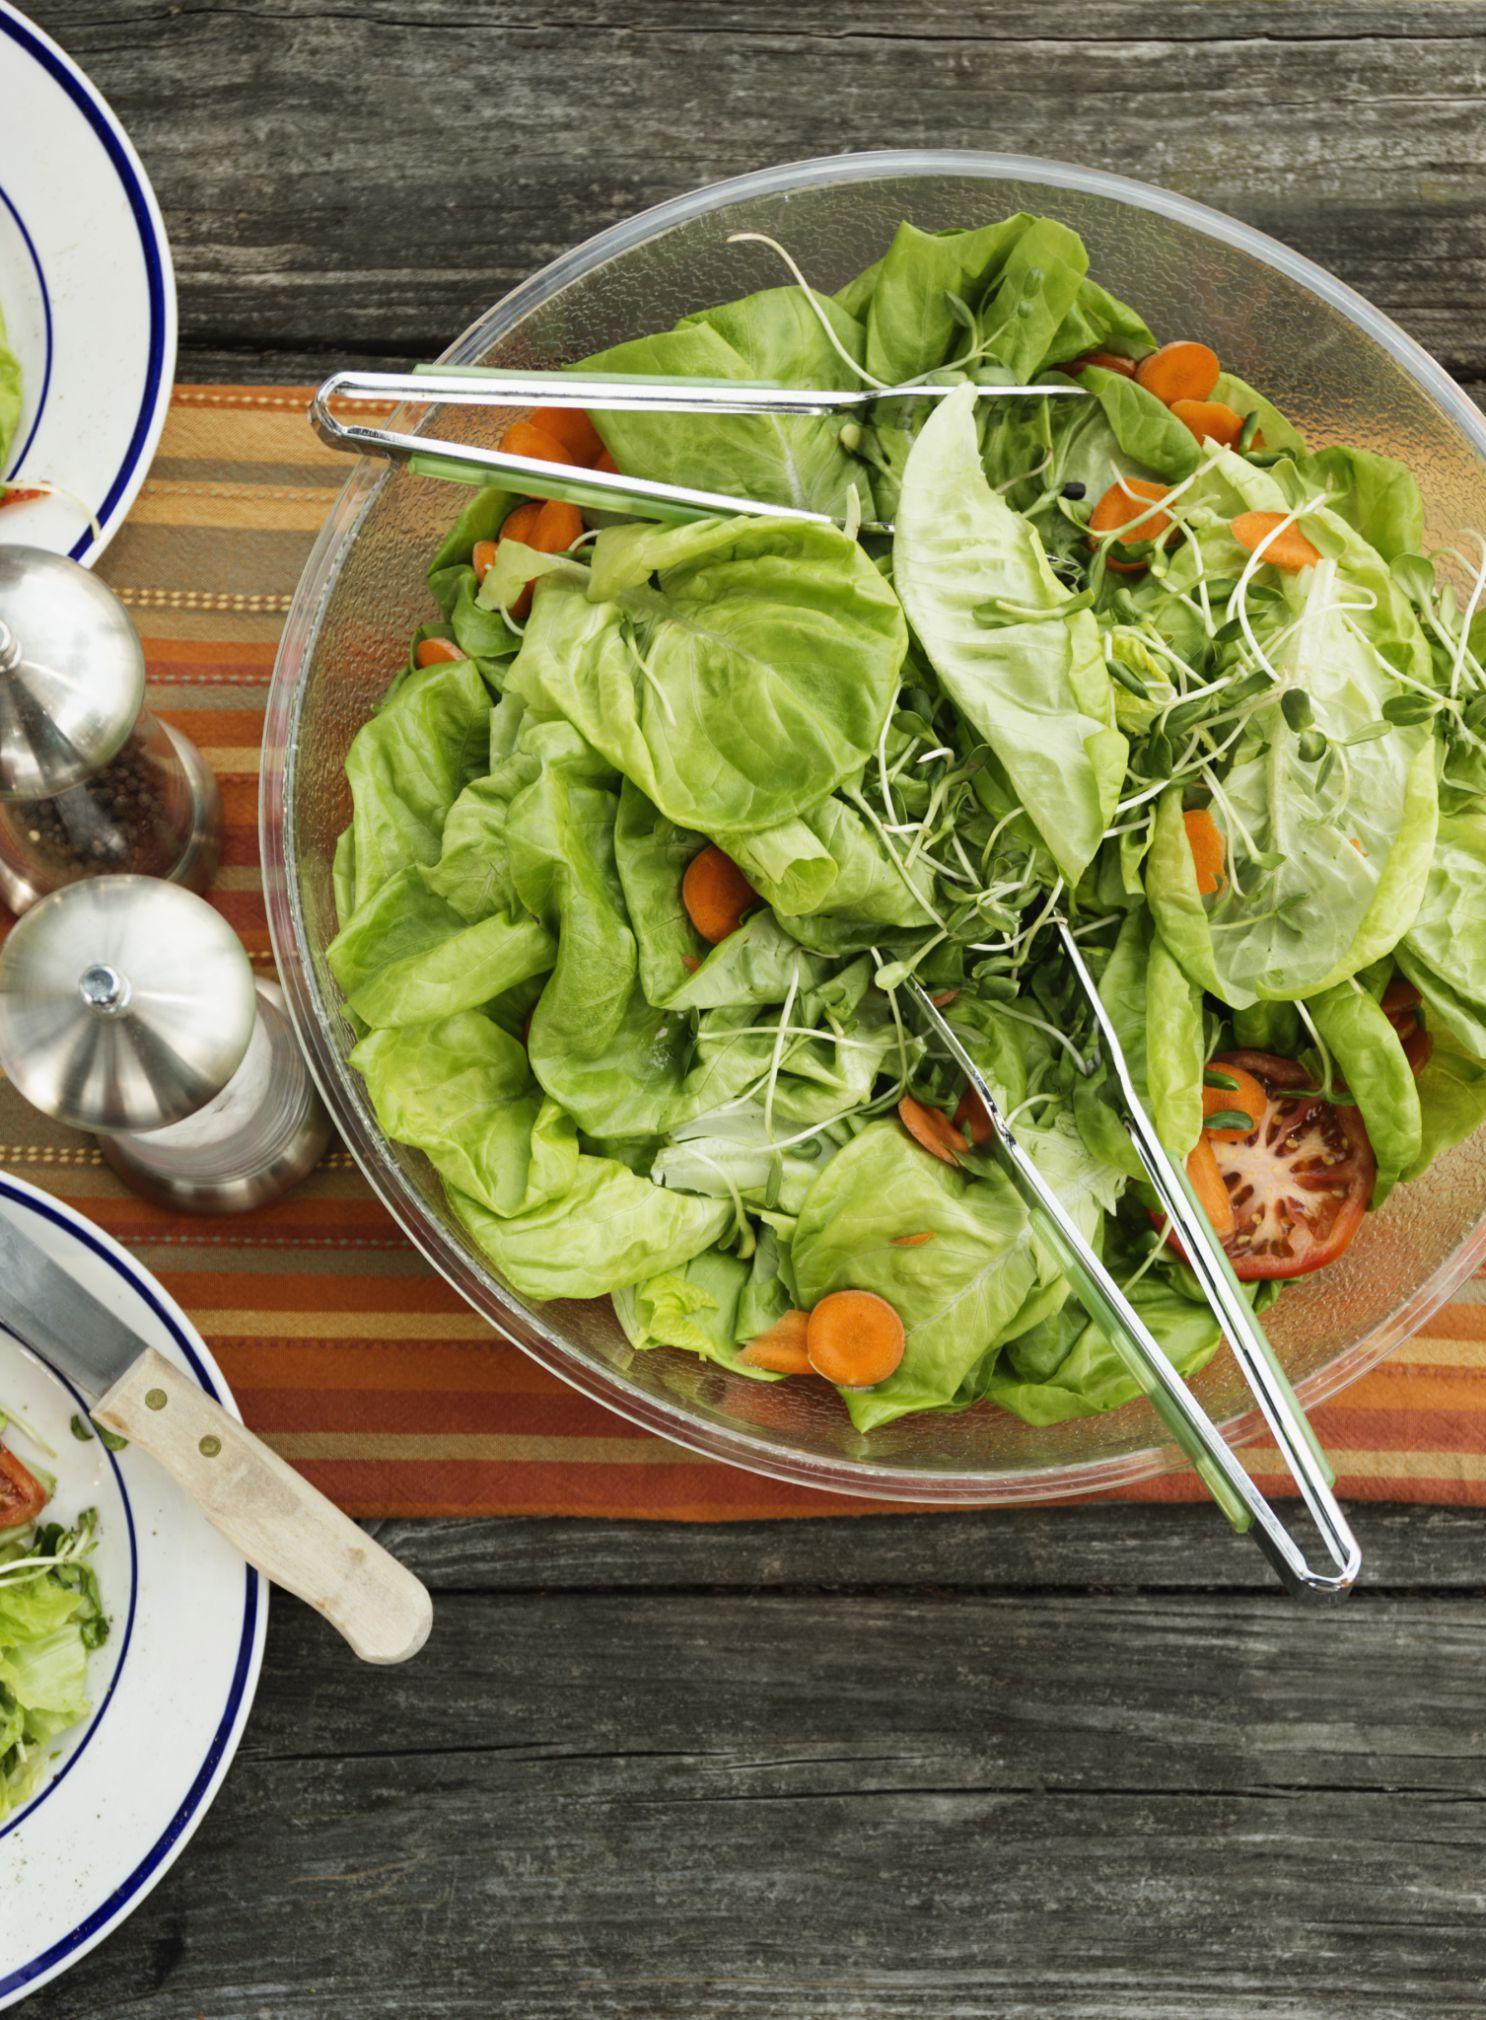 german salad dressing for lettuce salad salatsauce recipe